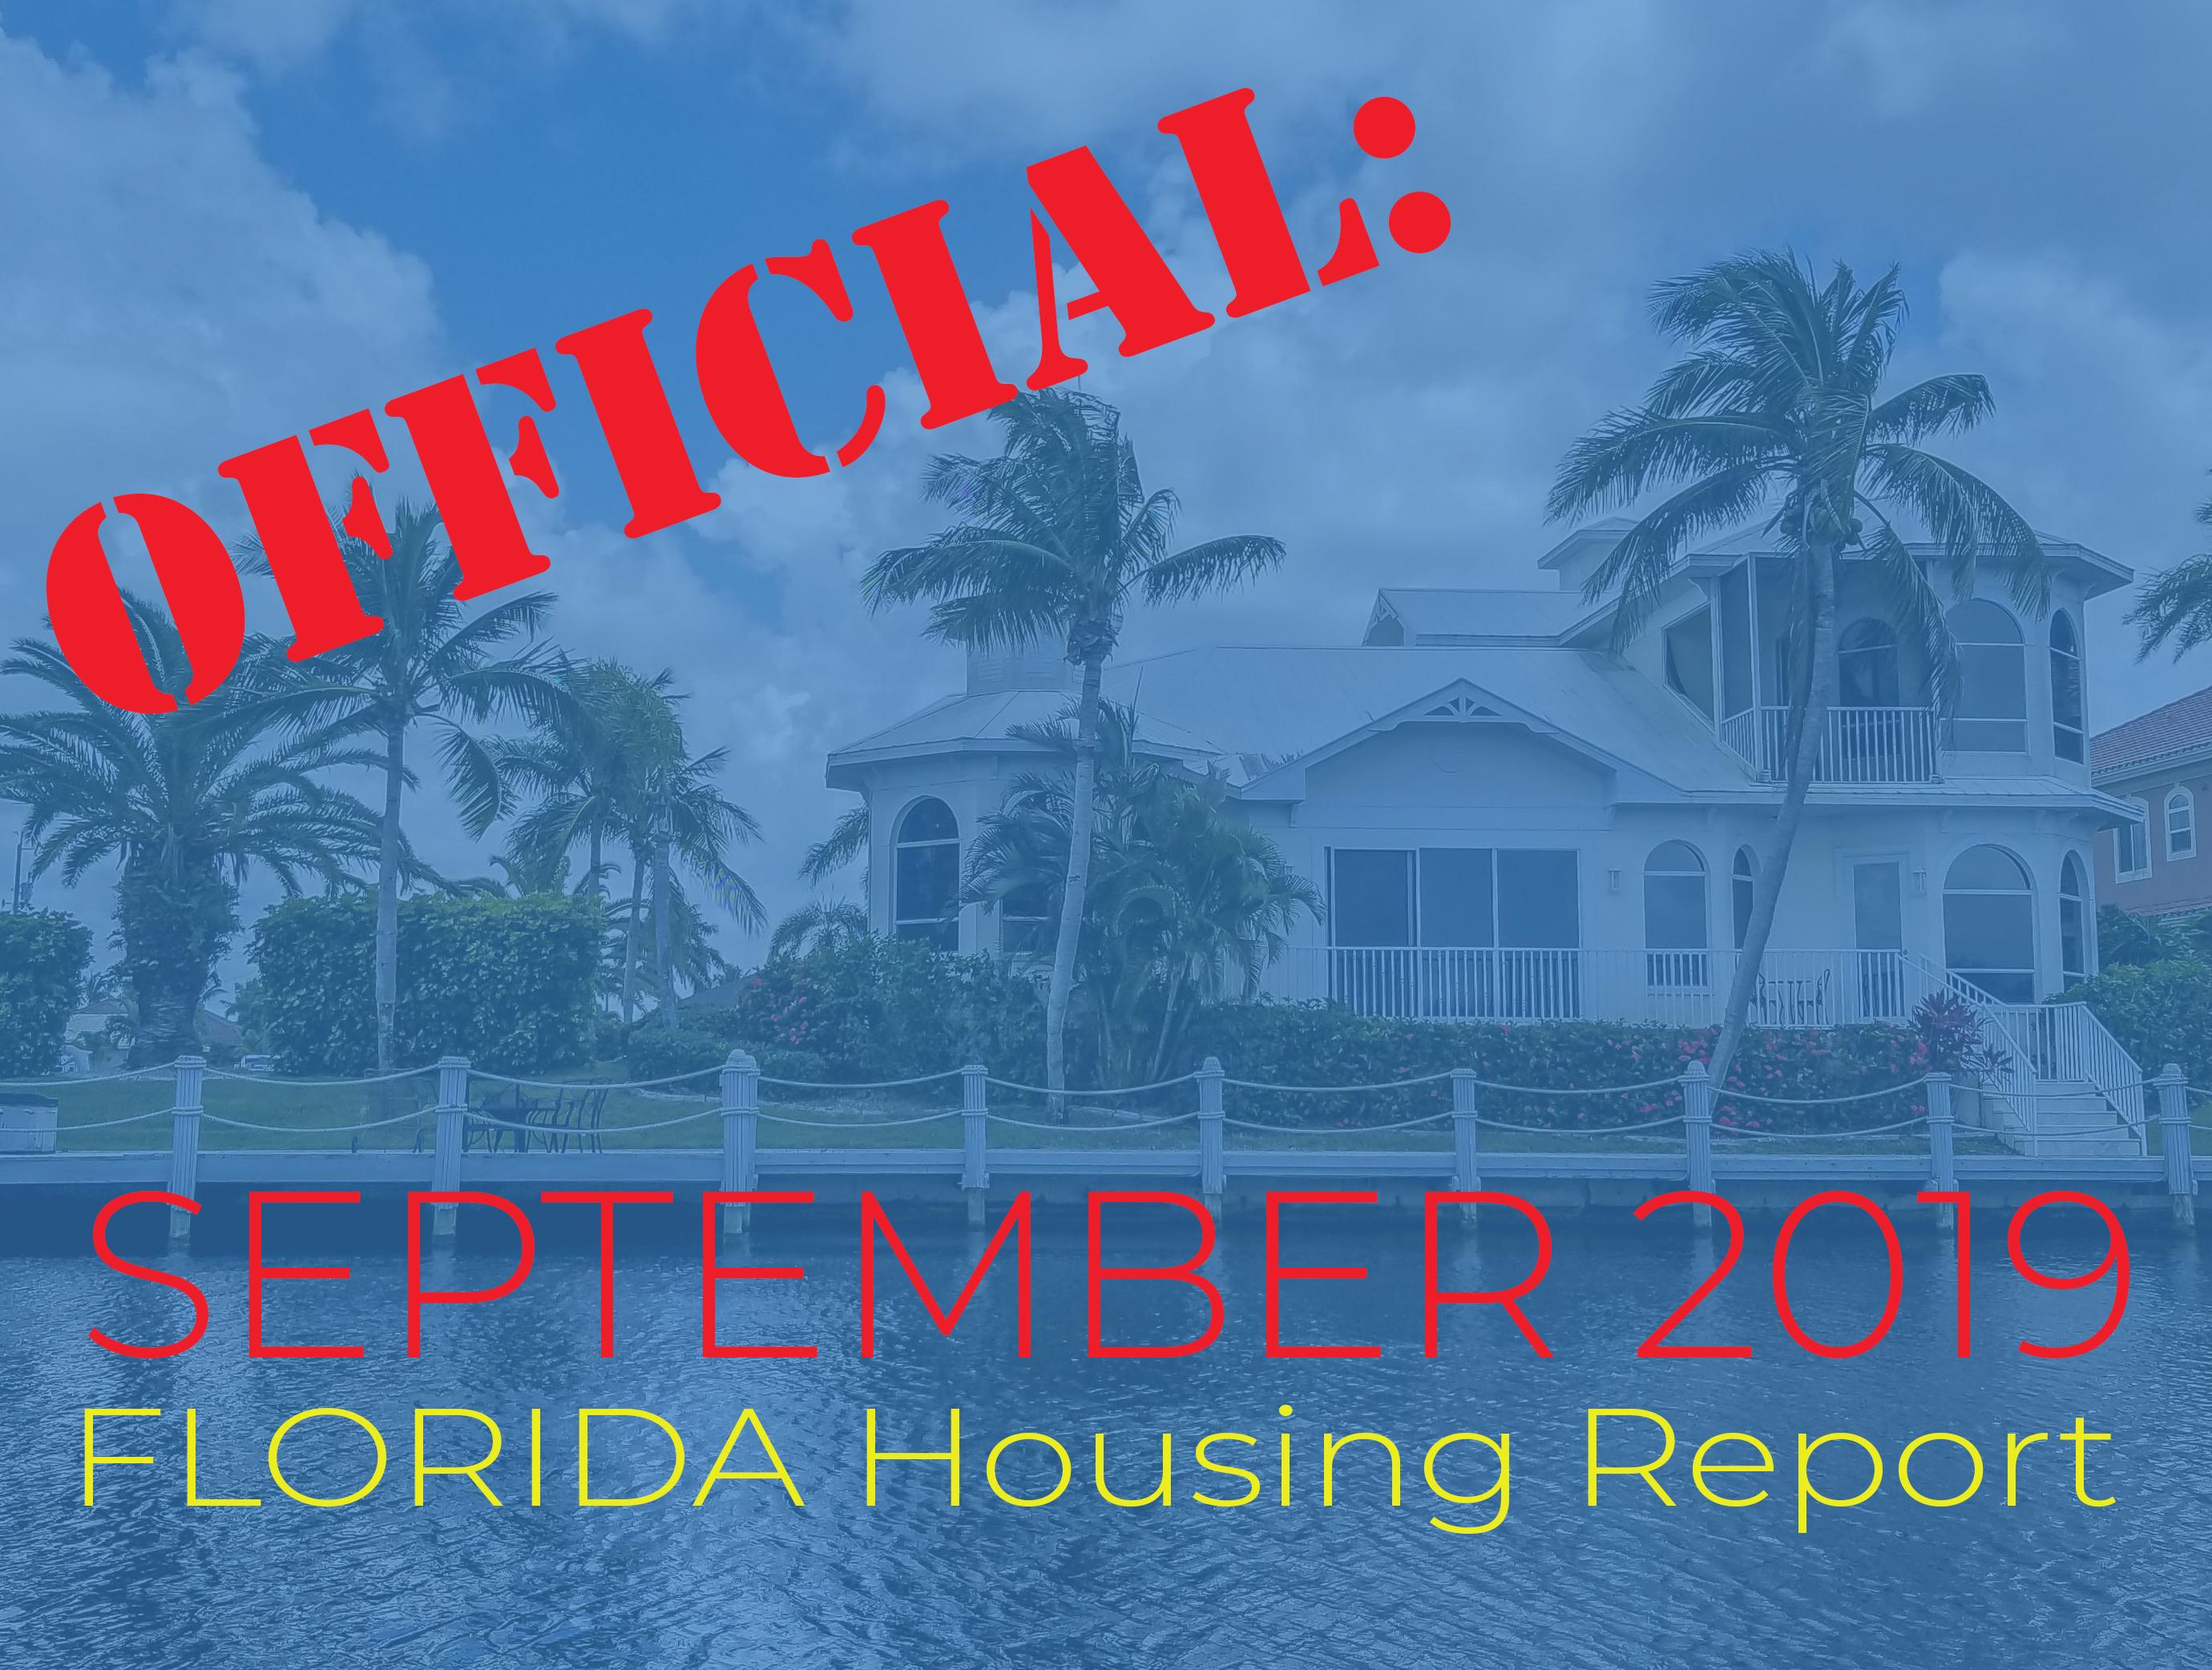 Official September 2019 Florida Housing Report